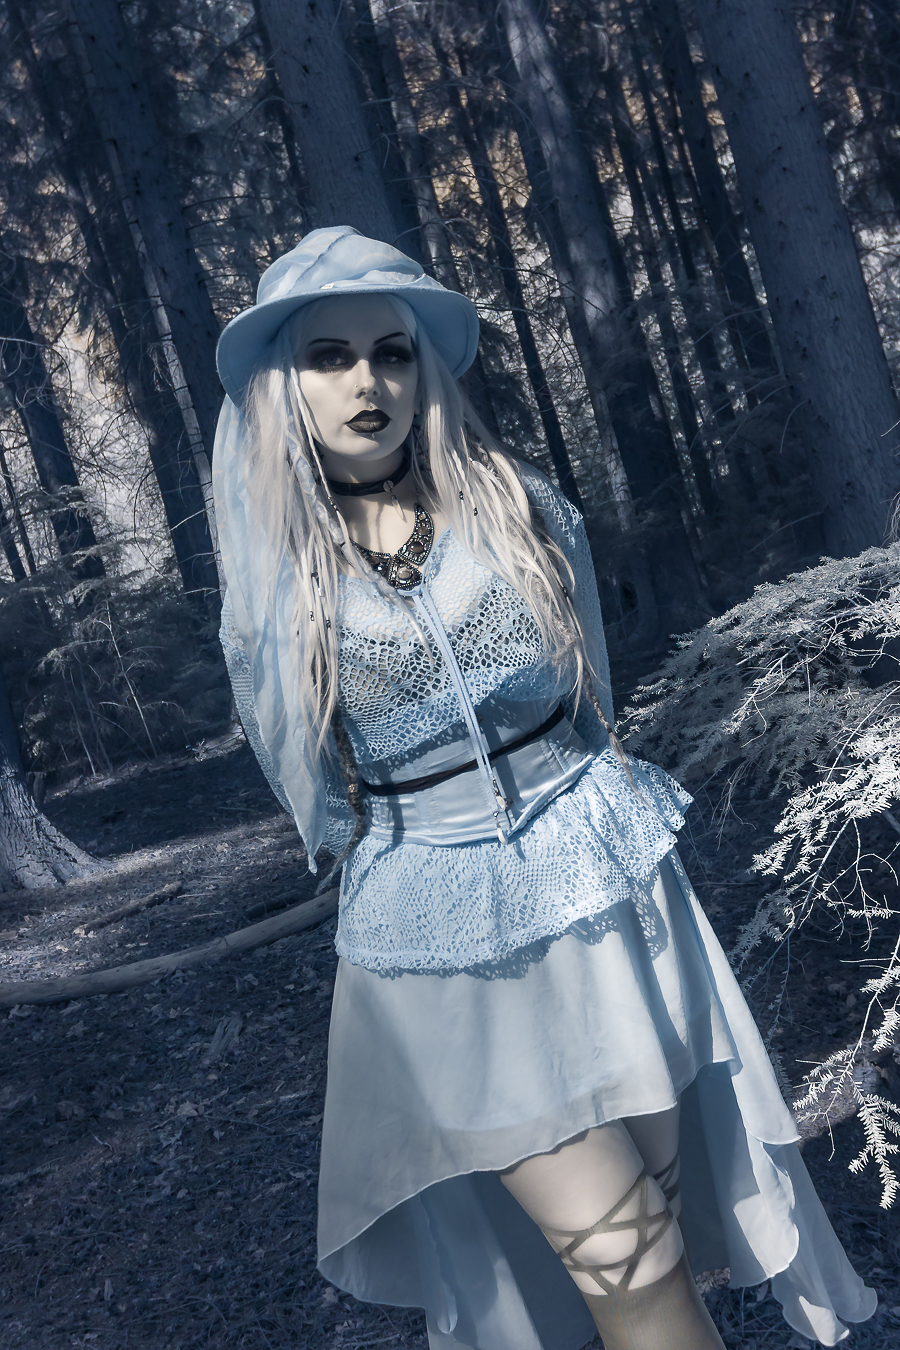 Infrared Gothic / Photography by @PhotoPhilljk, Model Laurensafreak, Makeup by Laurensafreak, Post processing by @PhotoPhilljk, Stylist Laurensafreak / Uploaded 1st June 2021 @ 08:38 AM